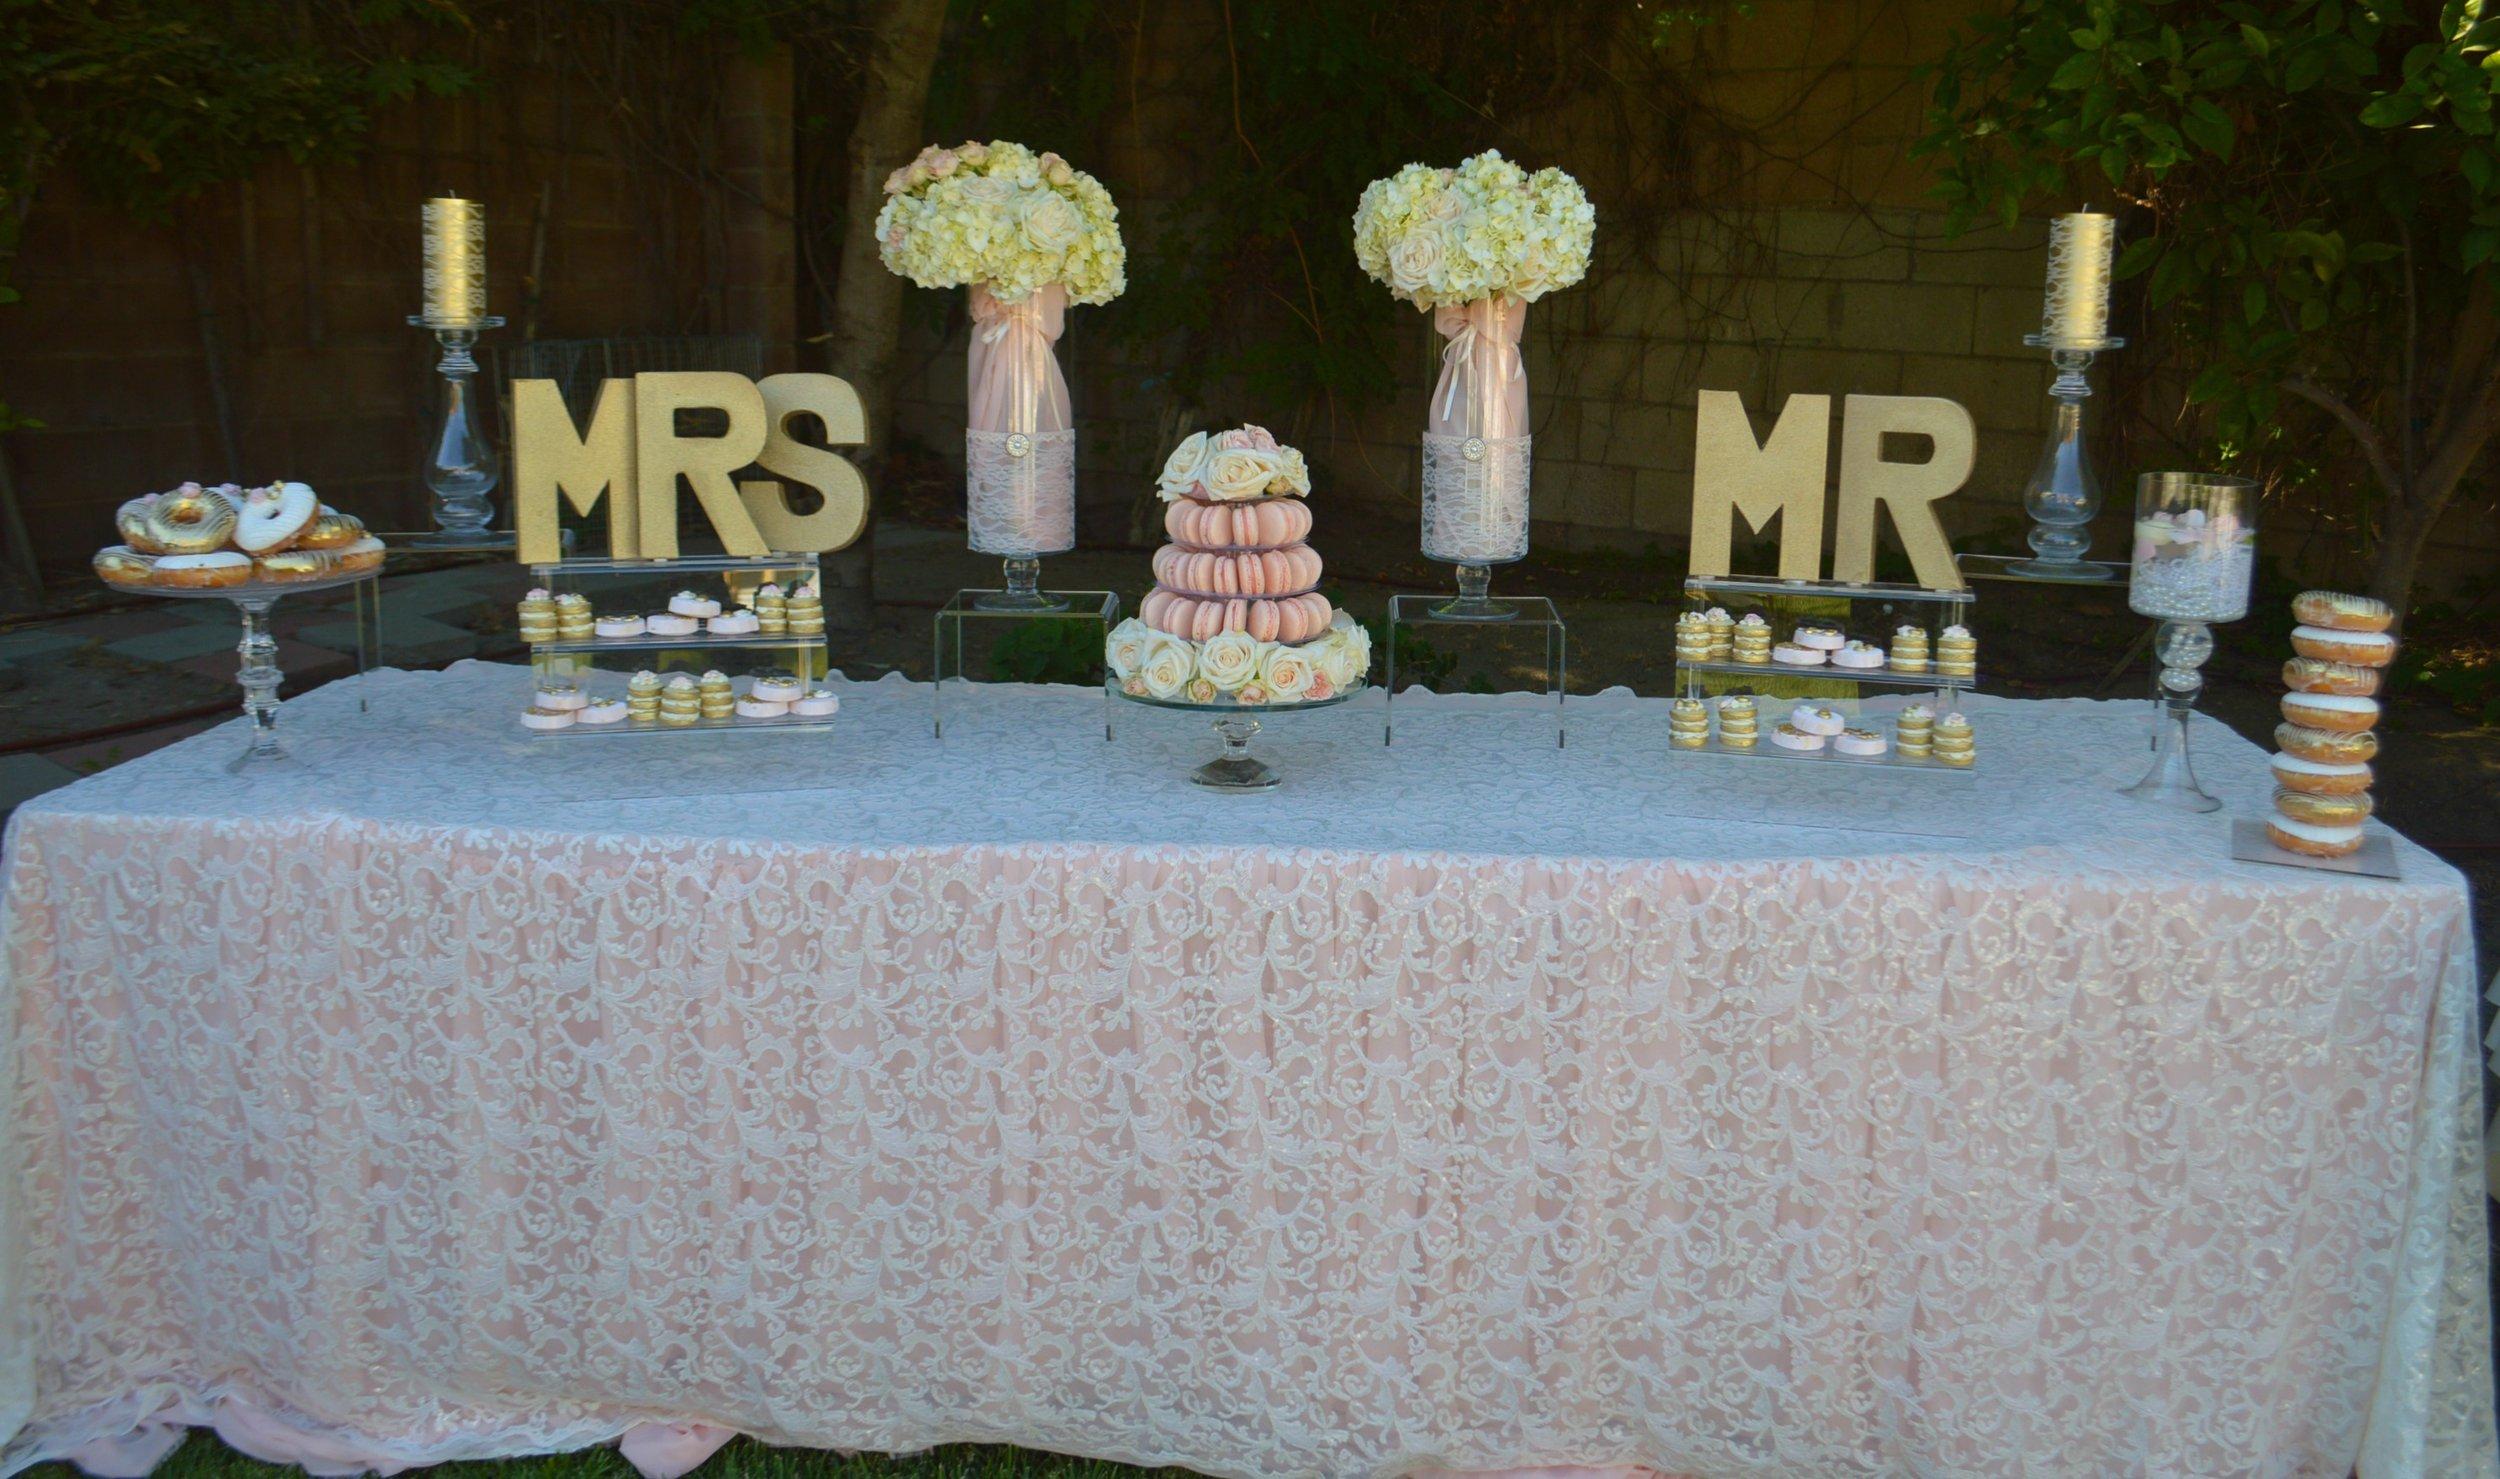 Mr and Mrs-Wedding-Wedding dessert table-wedding ideas-garden wedding-spring wedding-summer wedding-wedding macroons-macron- backyard wedding-www.SugarPartiesLA.com.jpg